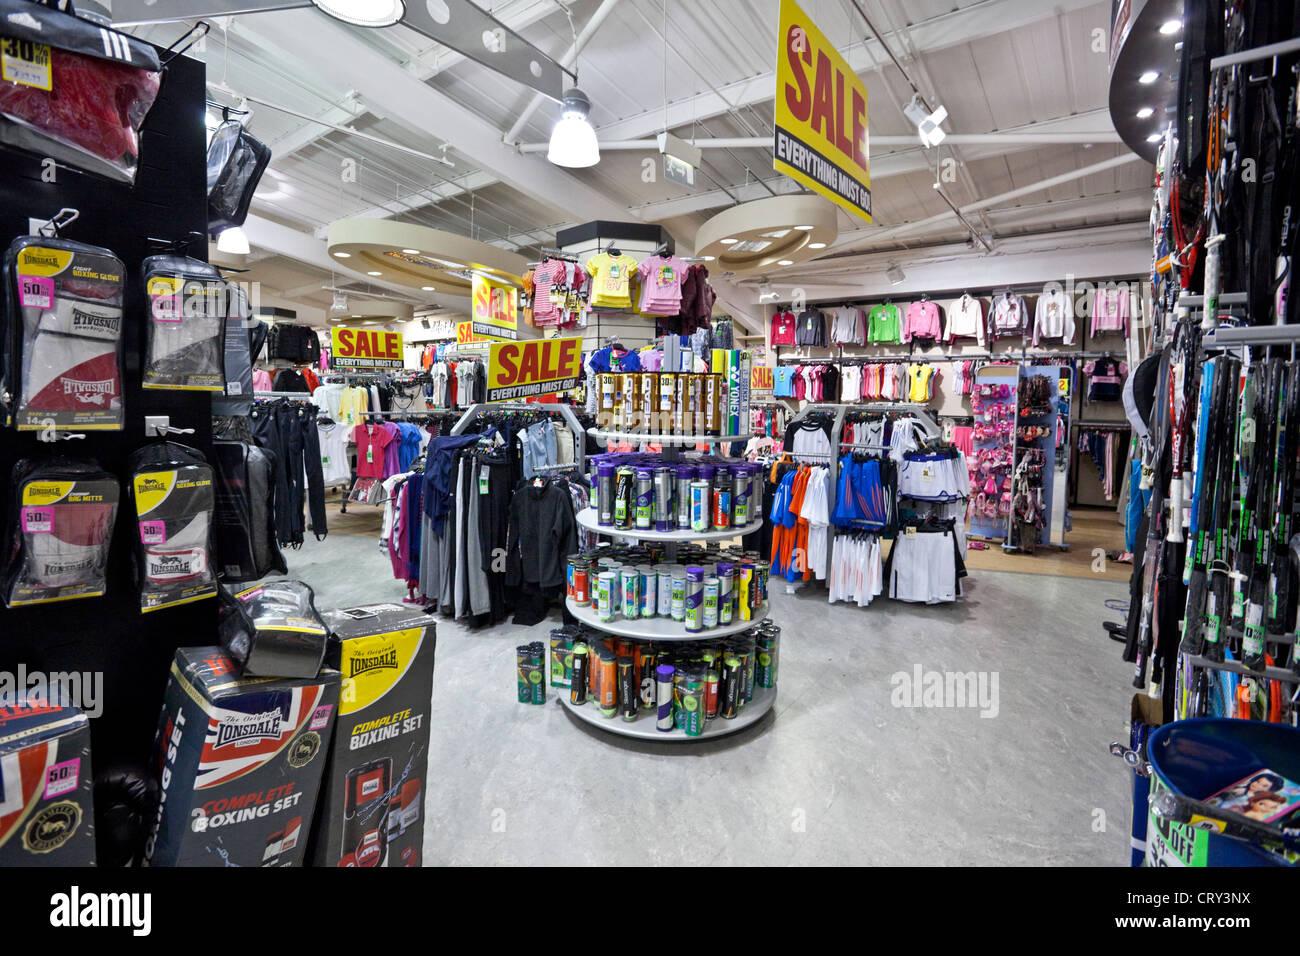 44e23f67e7 Sports Store Interior Stock Photos   Sports Store Interior Stock ...